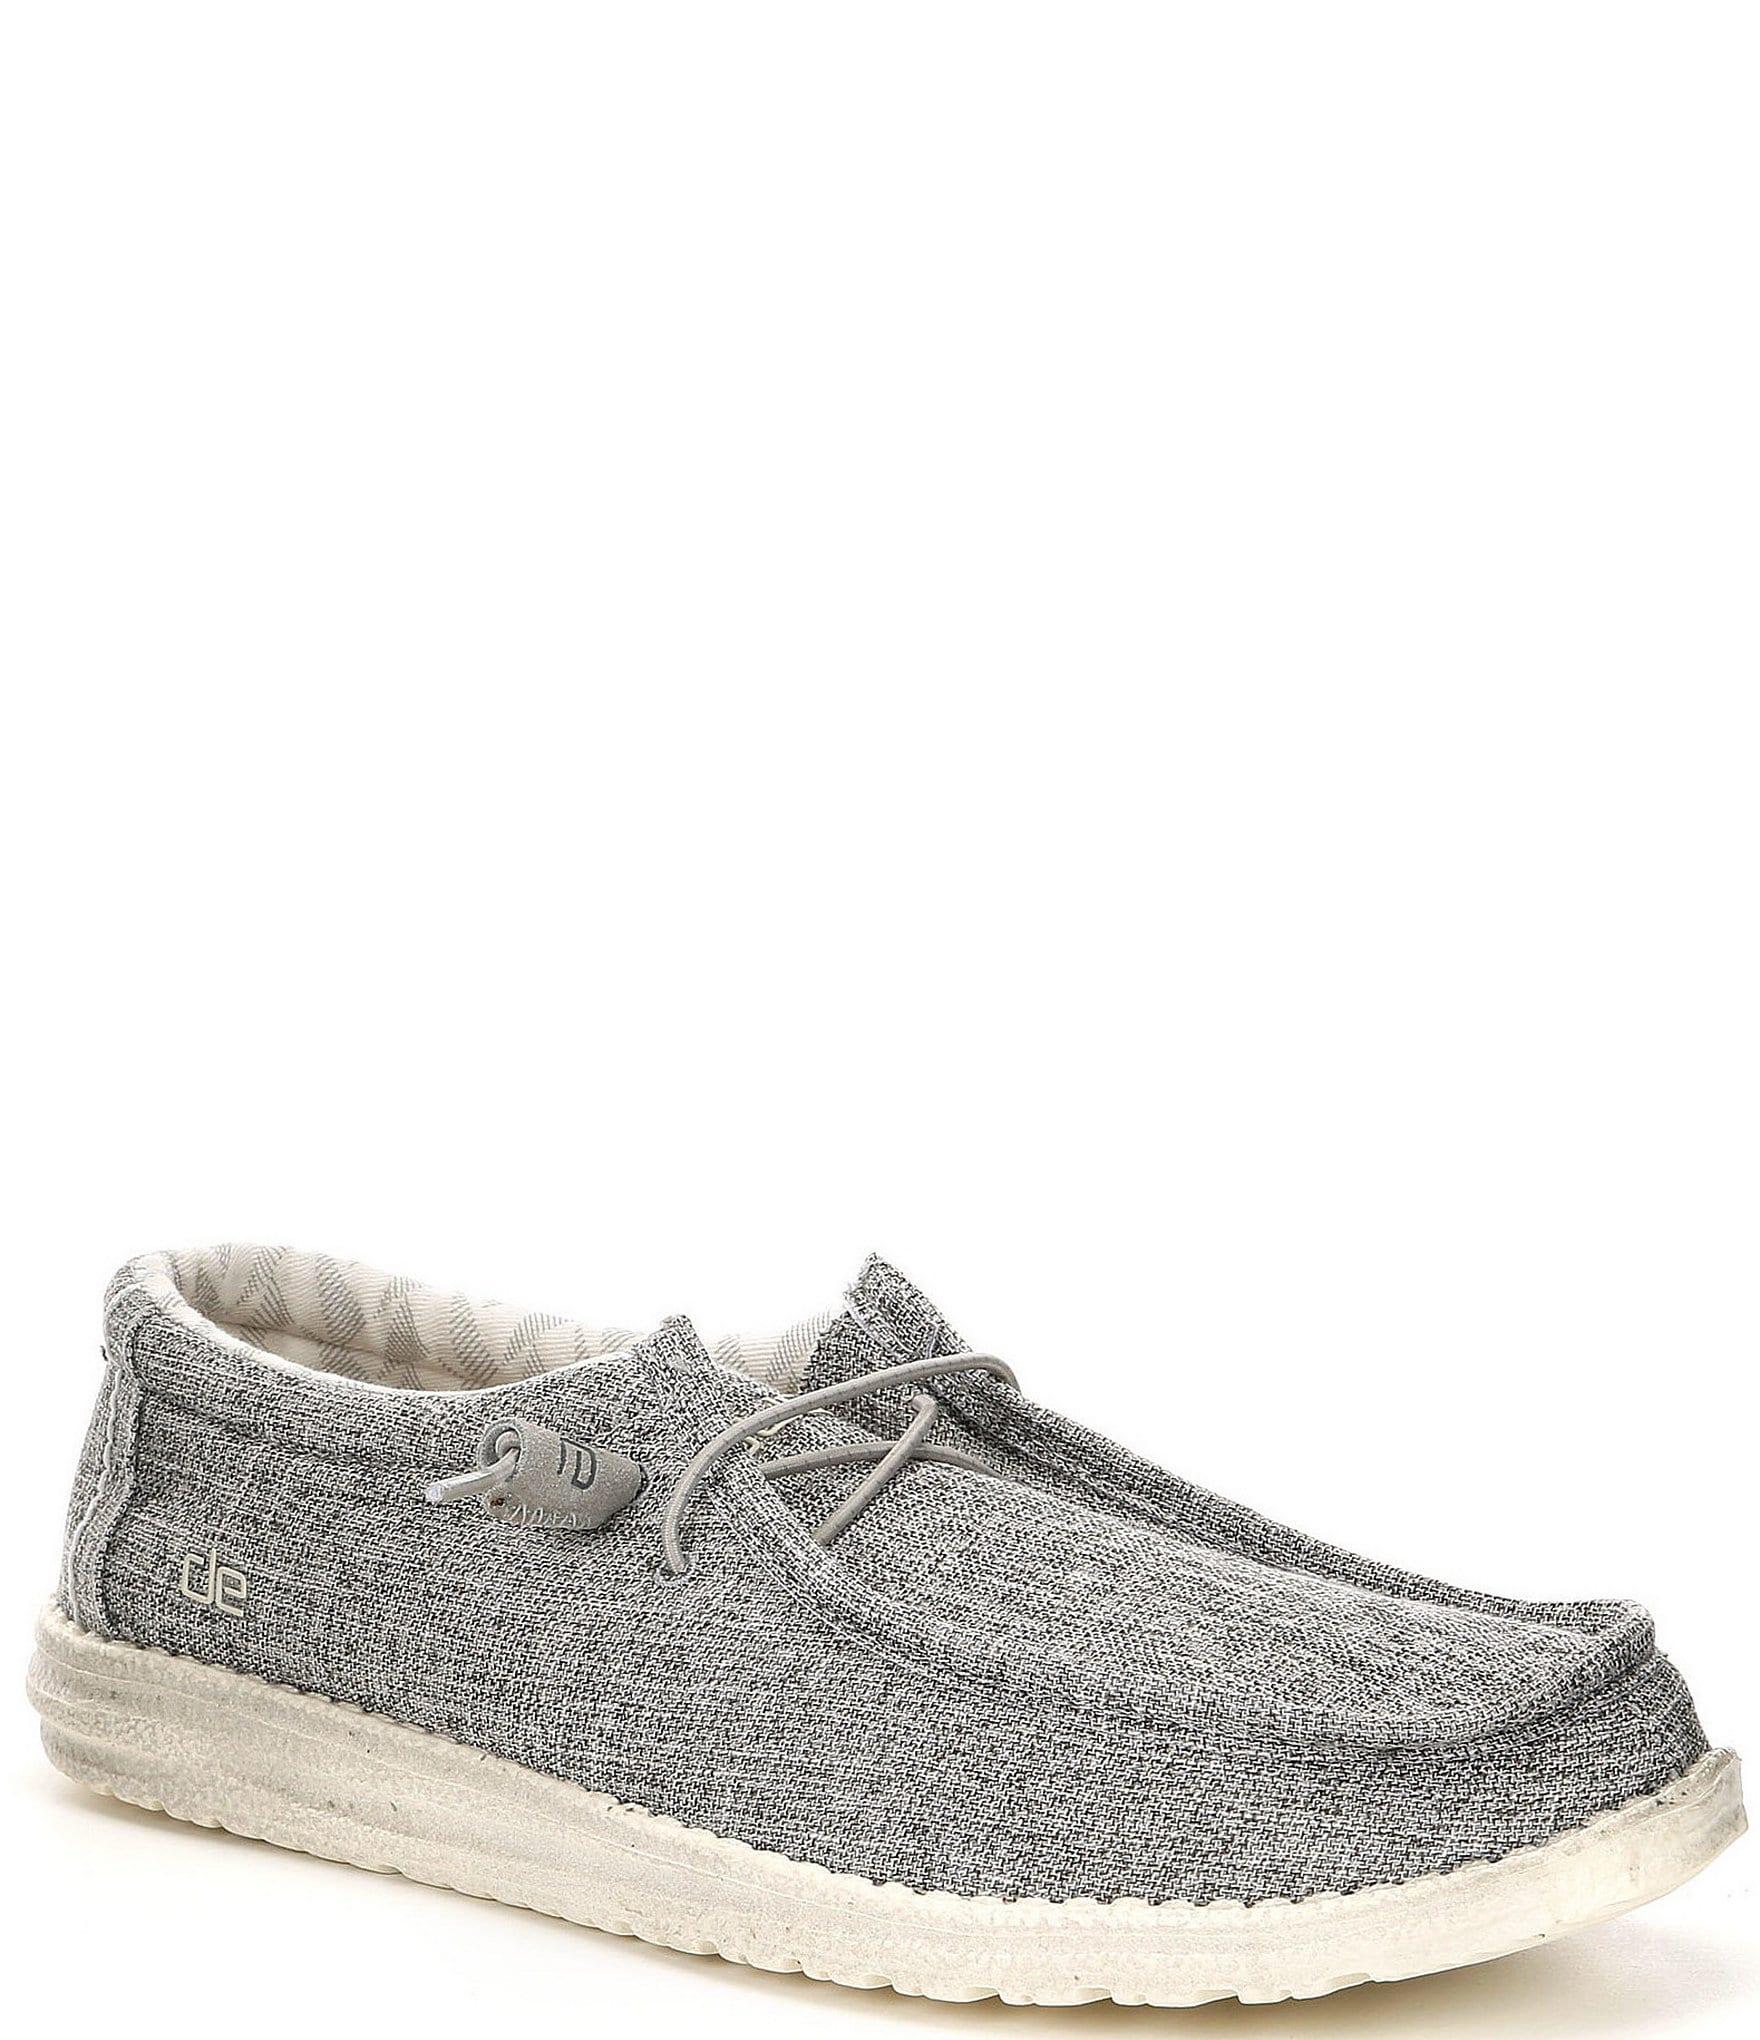 Hey Dude Shoes | Dillard's